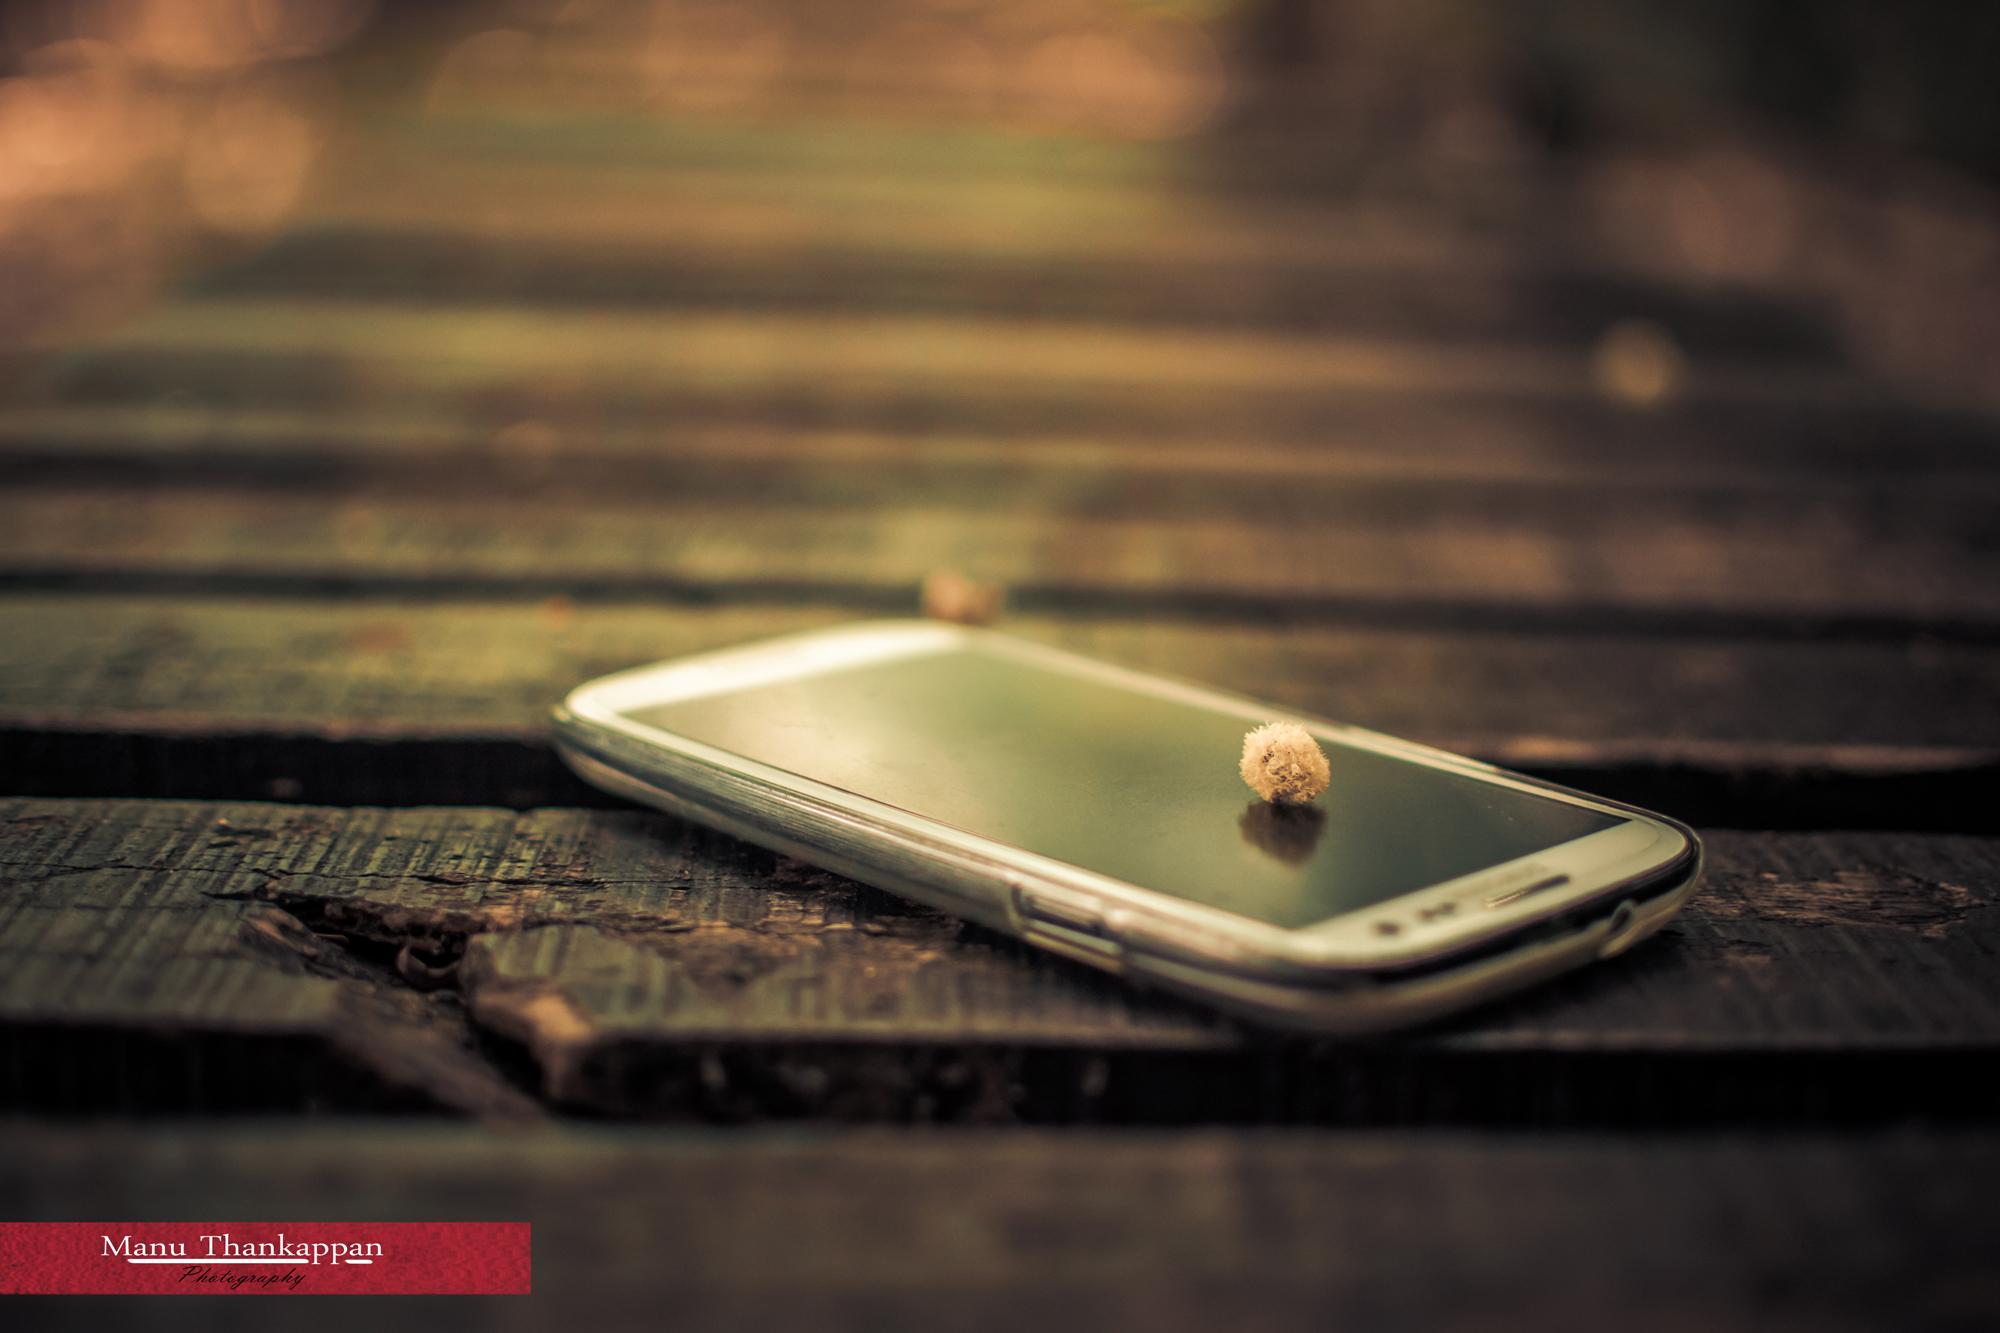 Kostenloses Telefon von india